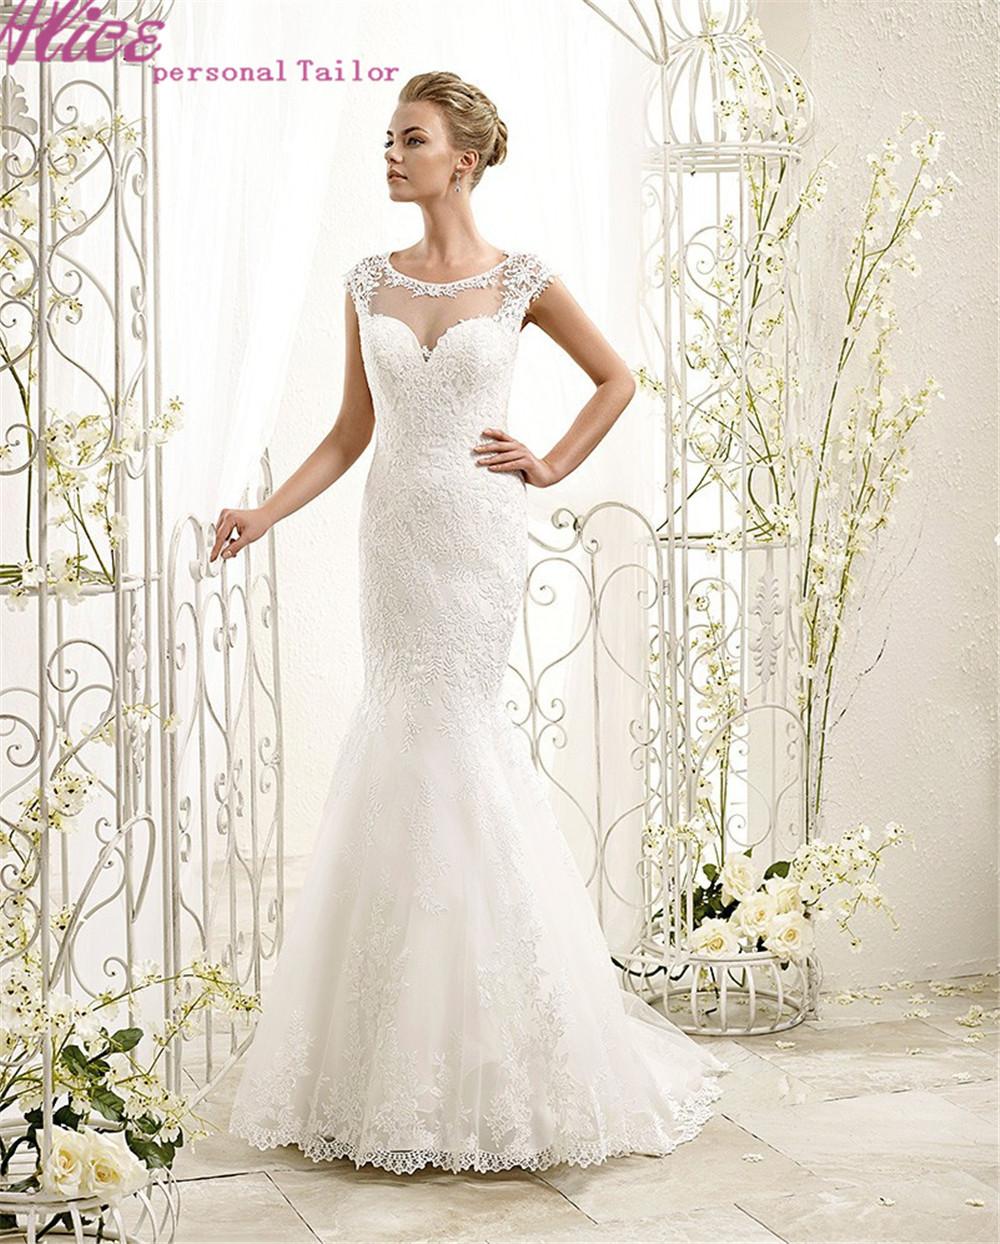 International wedding dresses buy junoir bridesmaid dresses for We buy wedding dresses